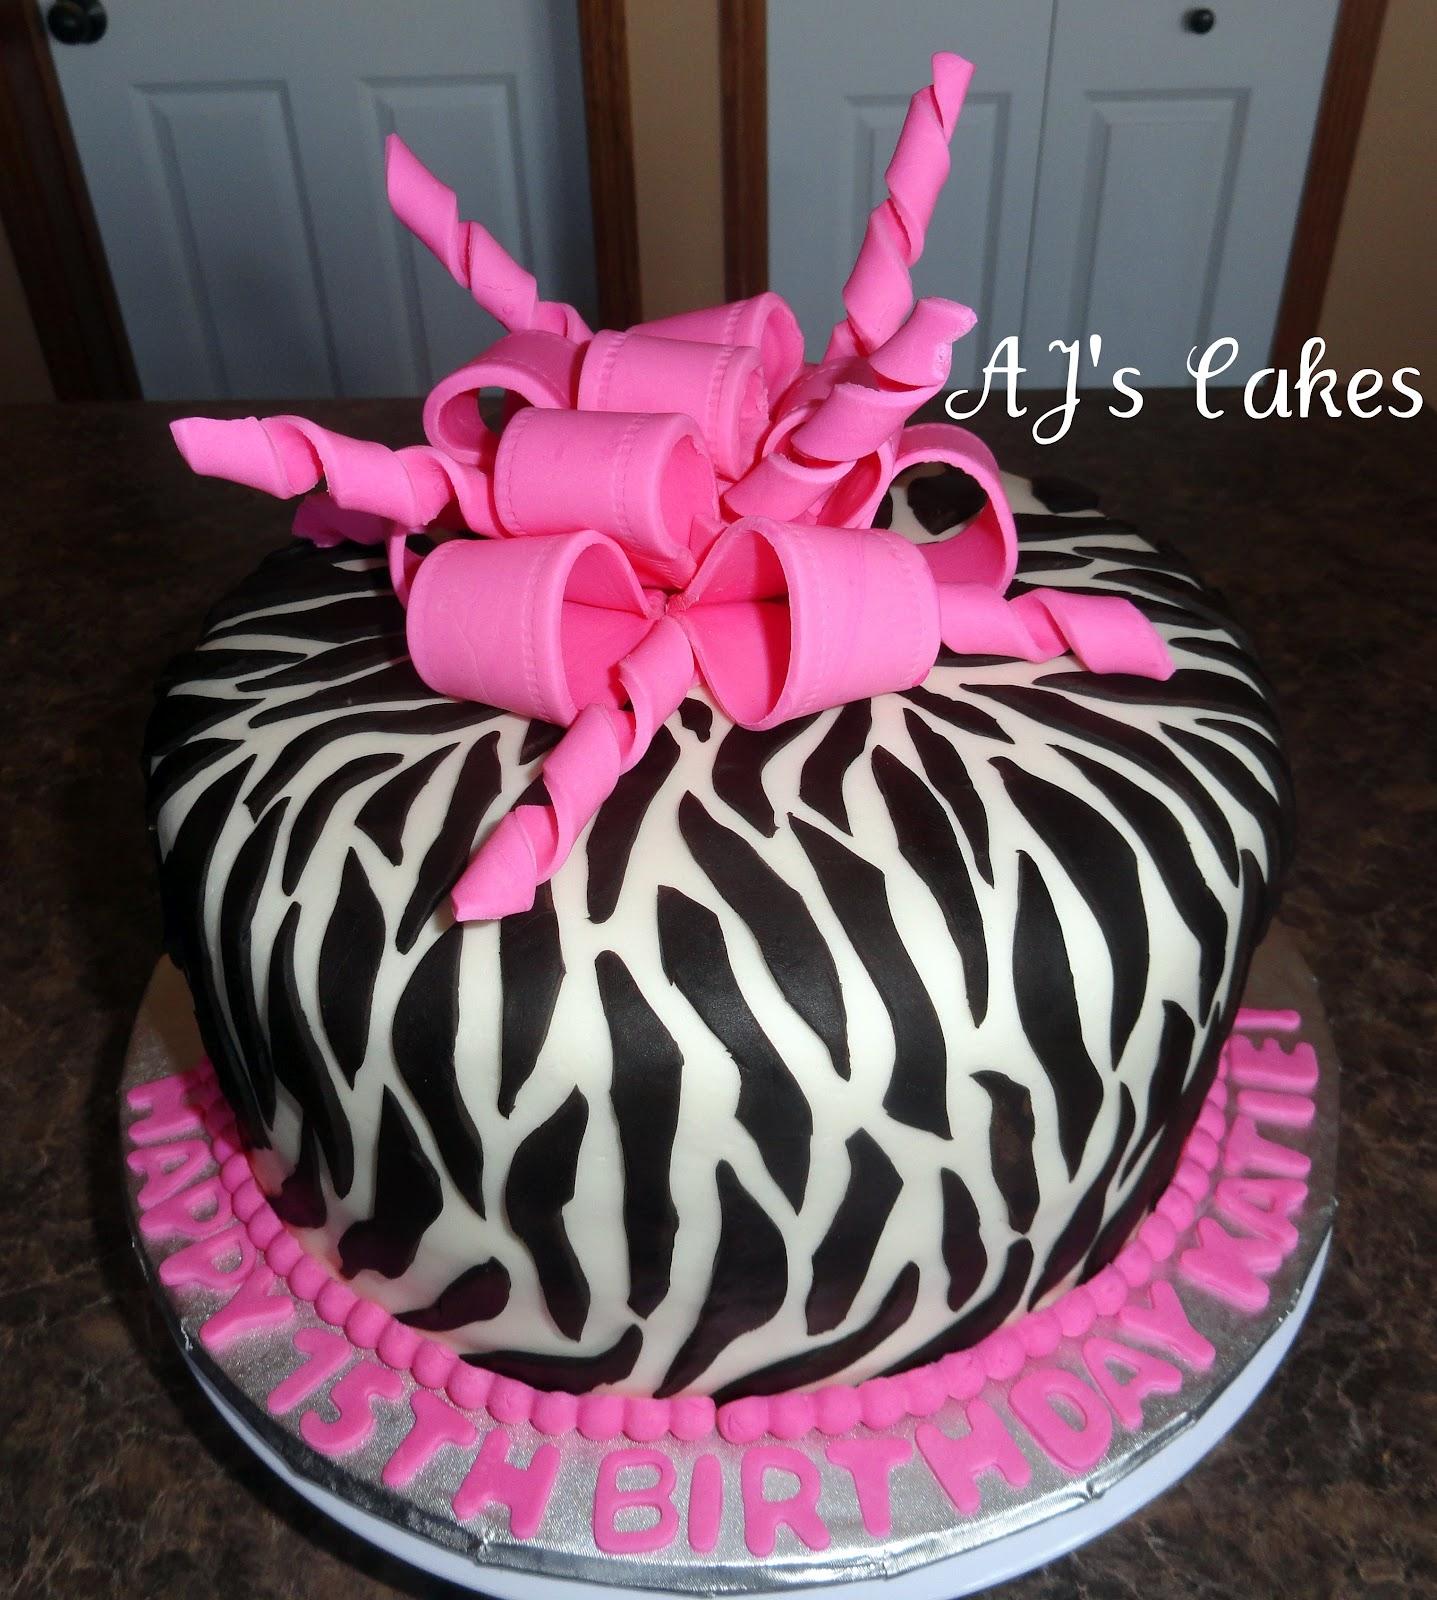 Ajs Cakes Pink And Black Zebra Cake